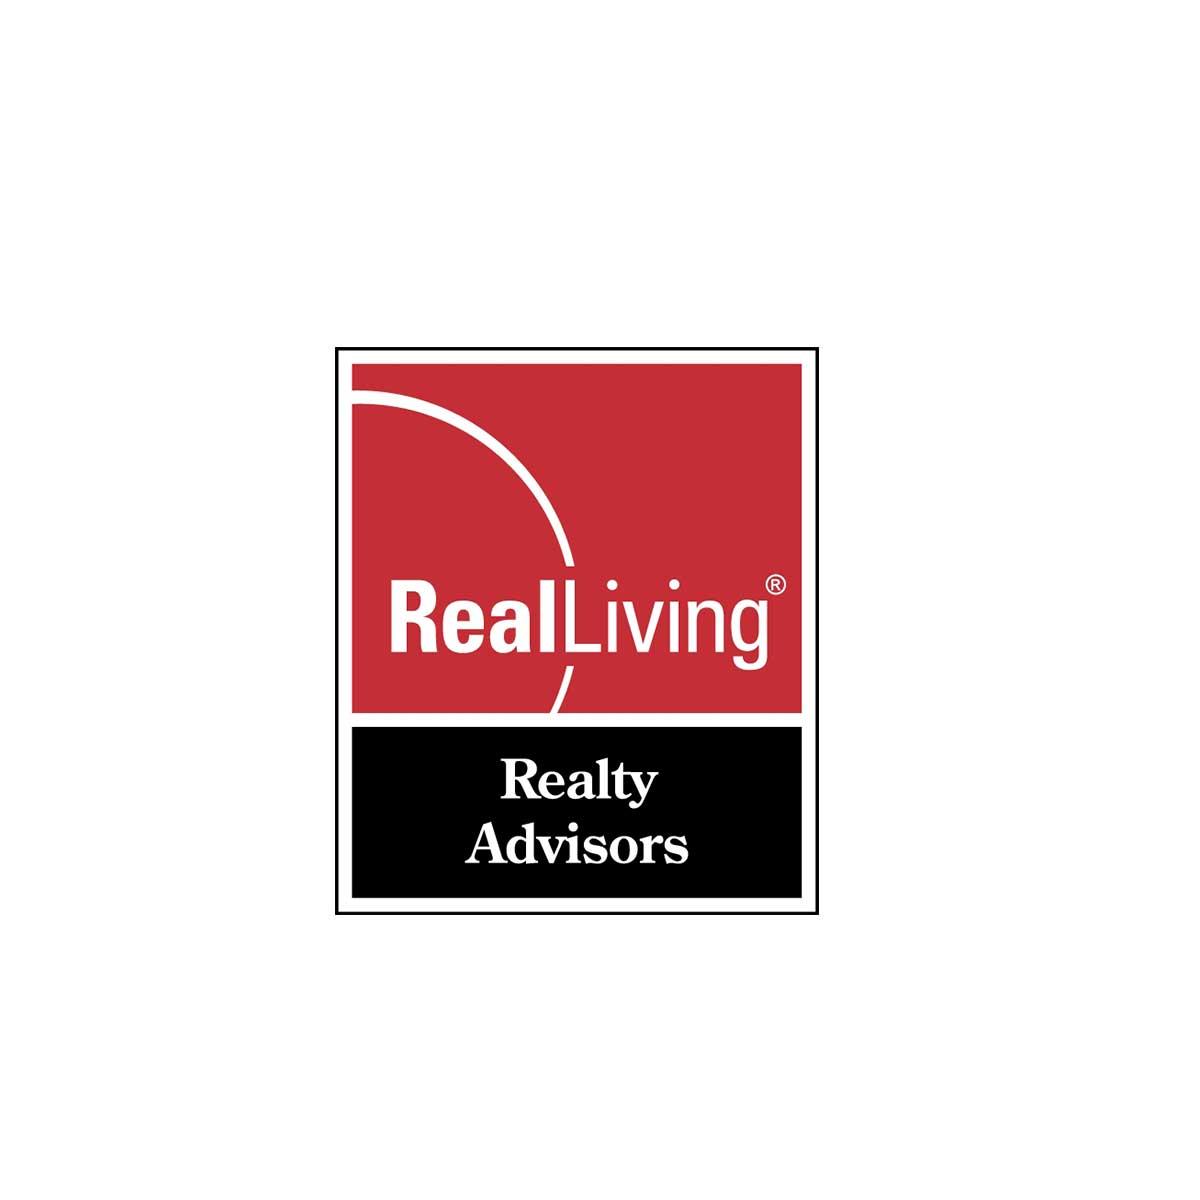 Real Living Realty Advisors